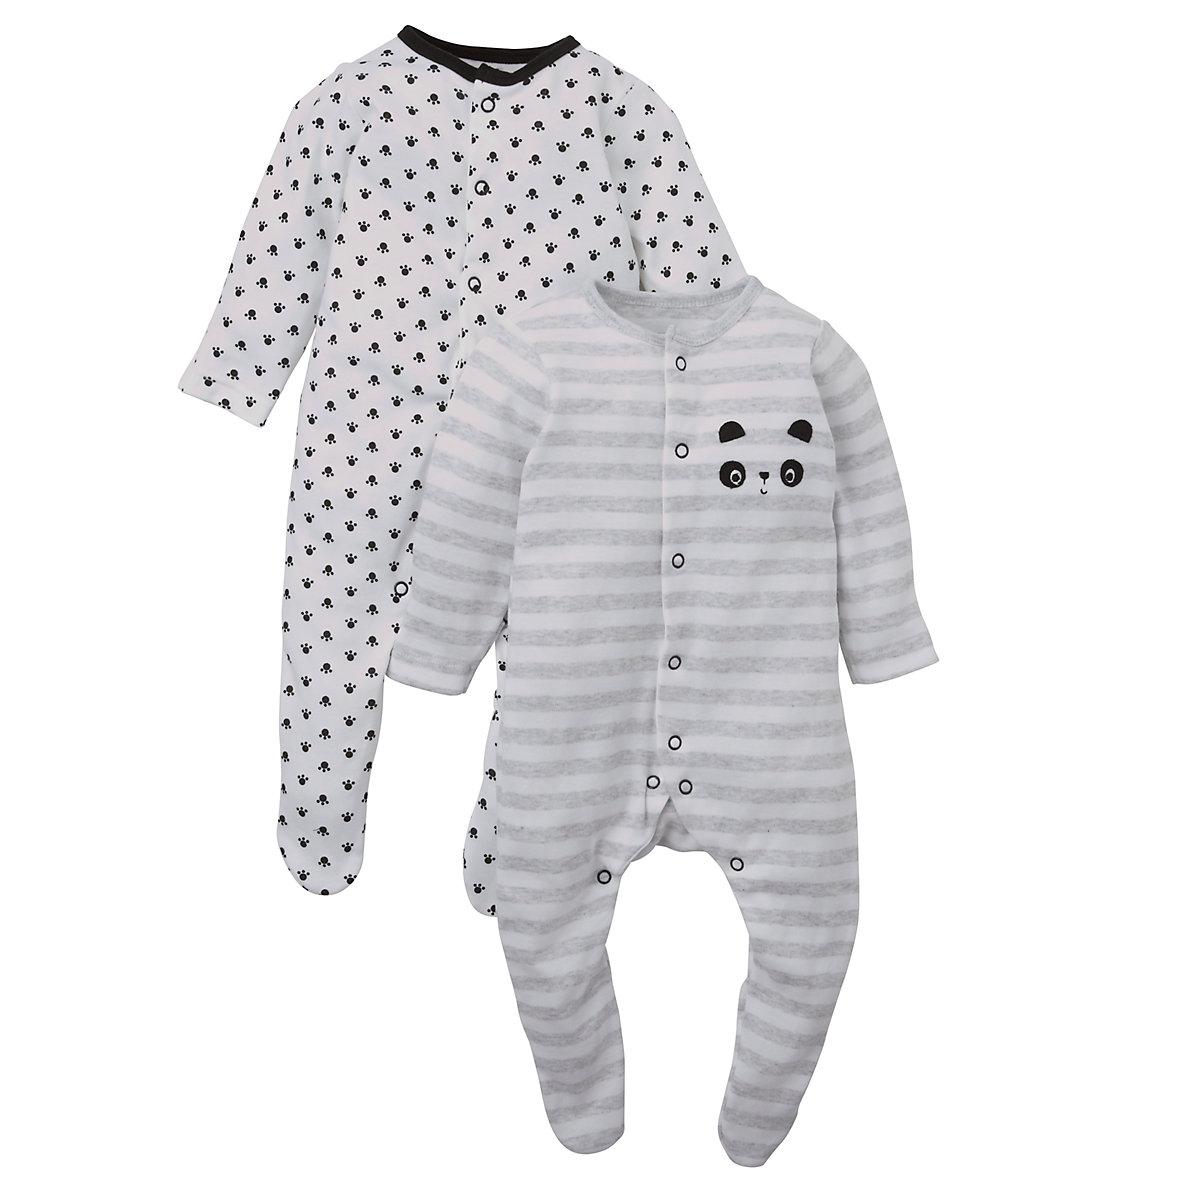 Mothercare Newborns Unisex Panda Sleepsuits - 2 Pack Size